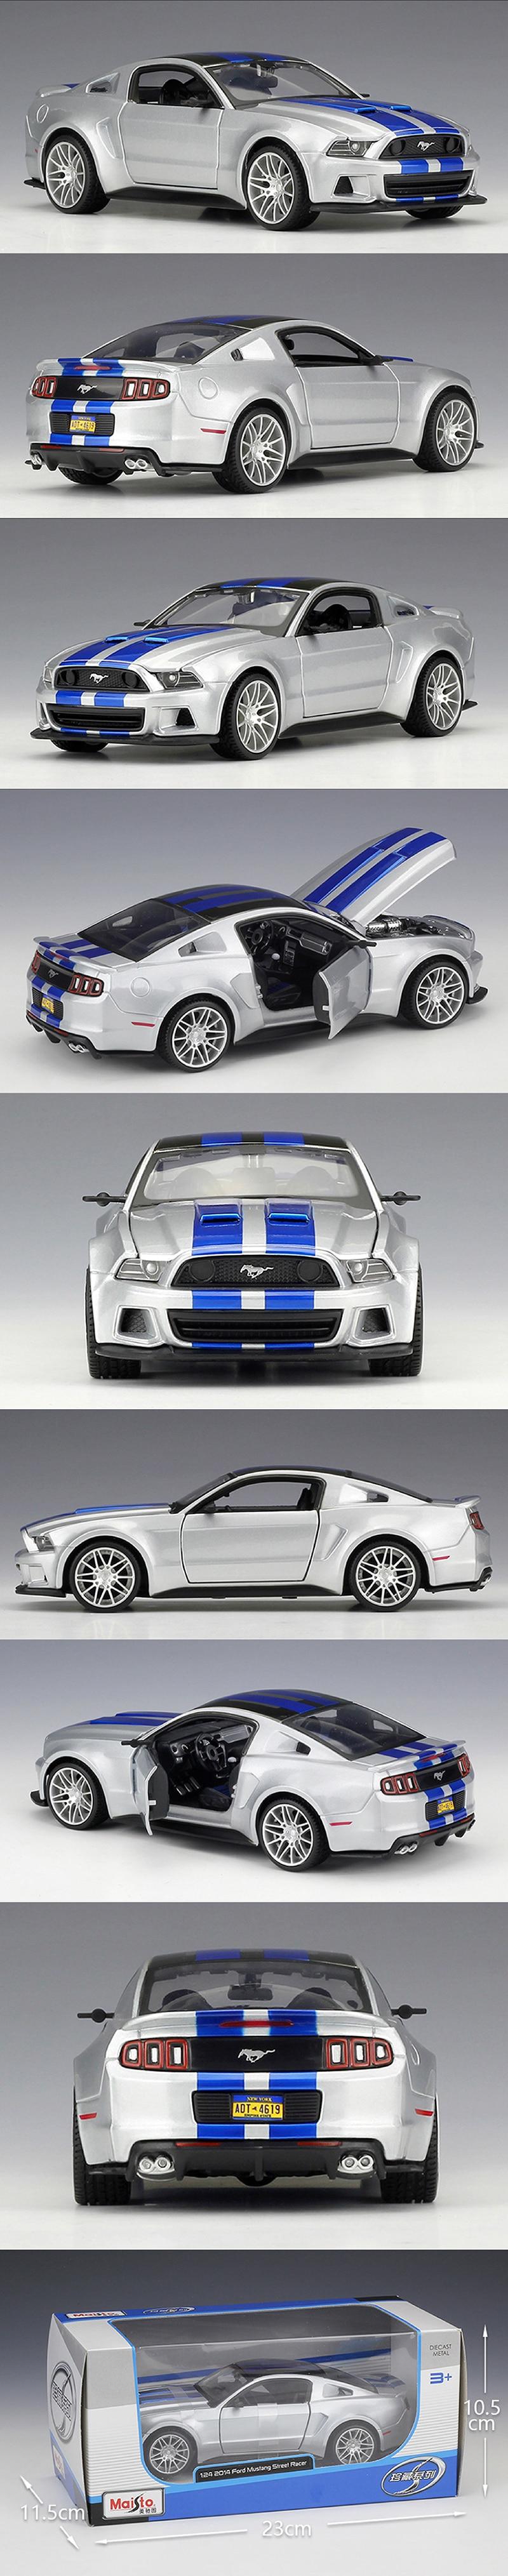 Ford Mustang Street Racer Diecast Model Car 6